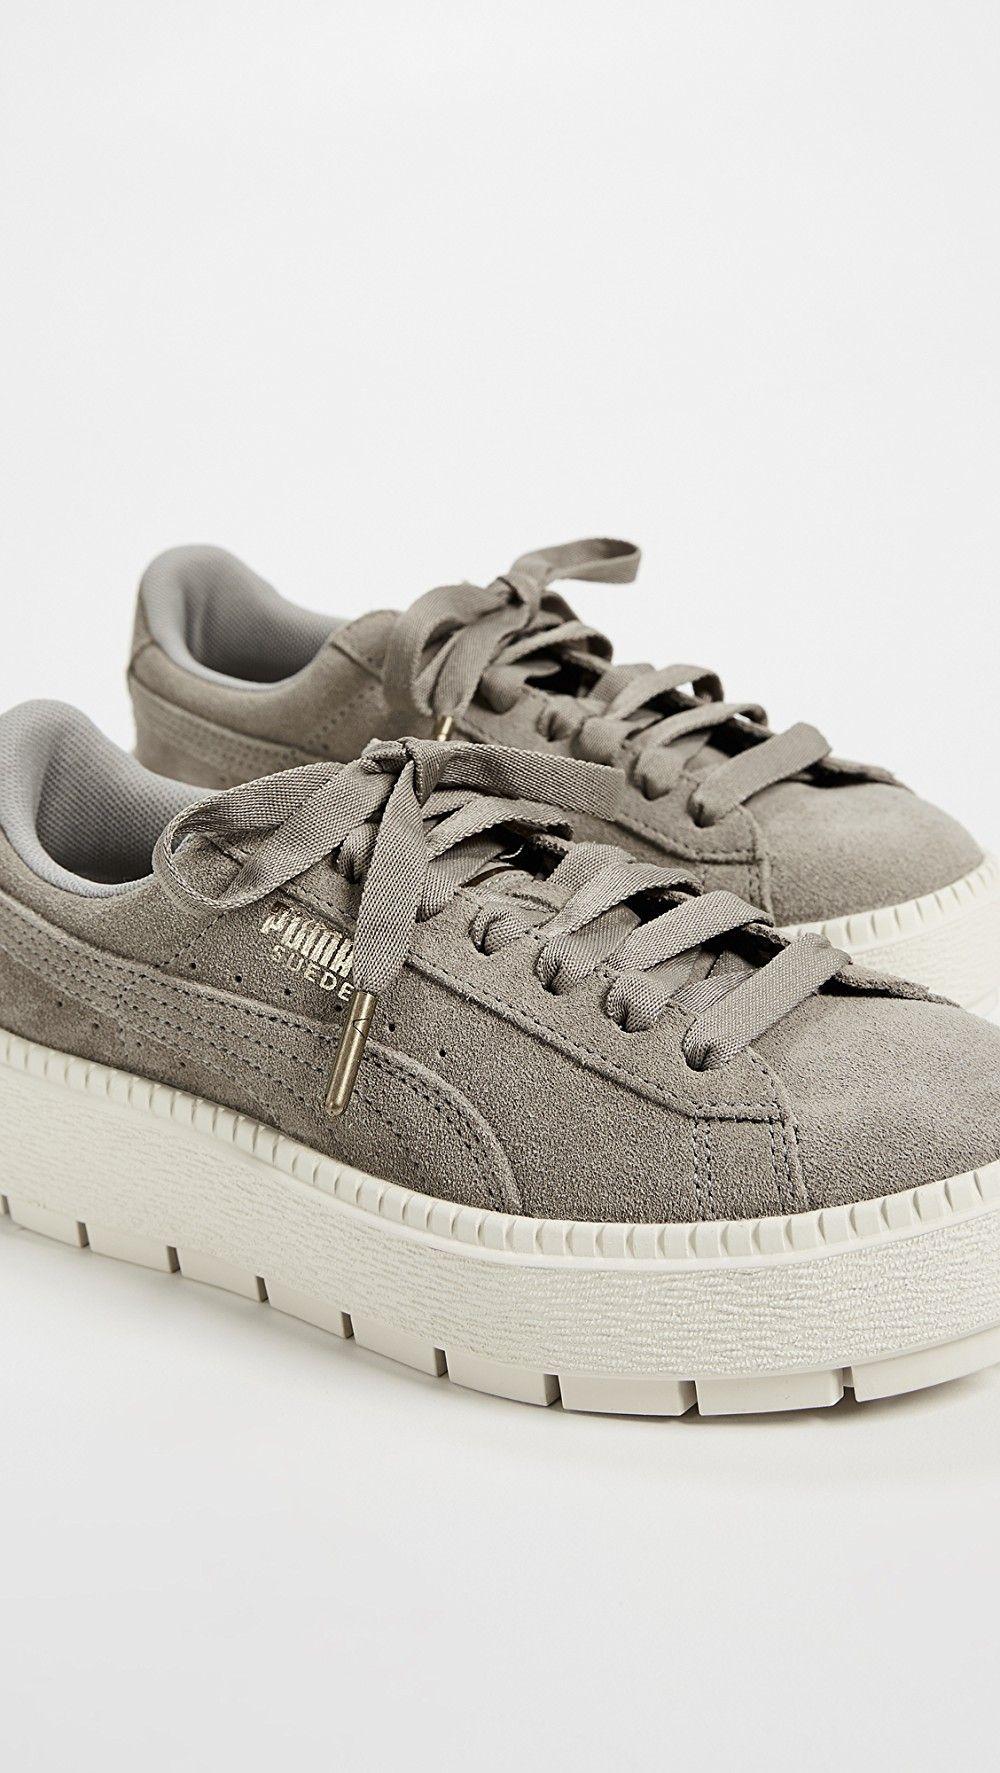 Puma Suede Platform Trace Sneakers